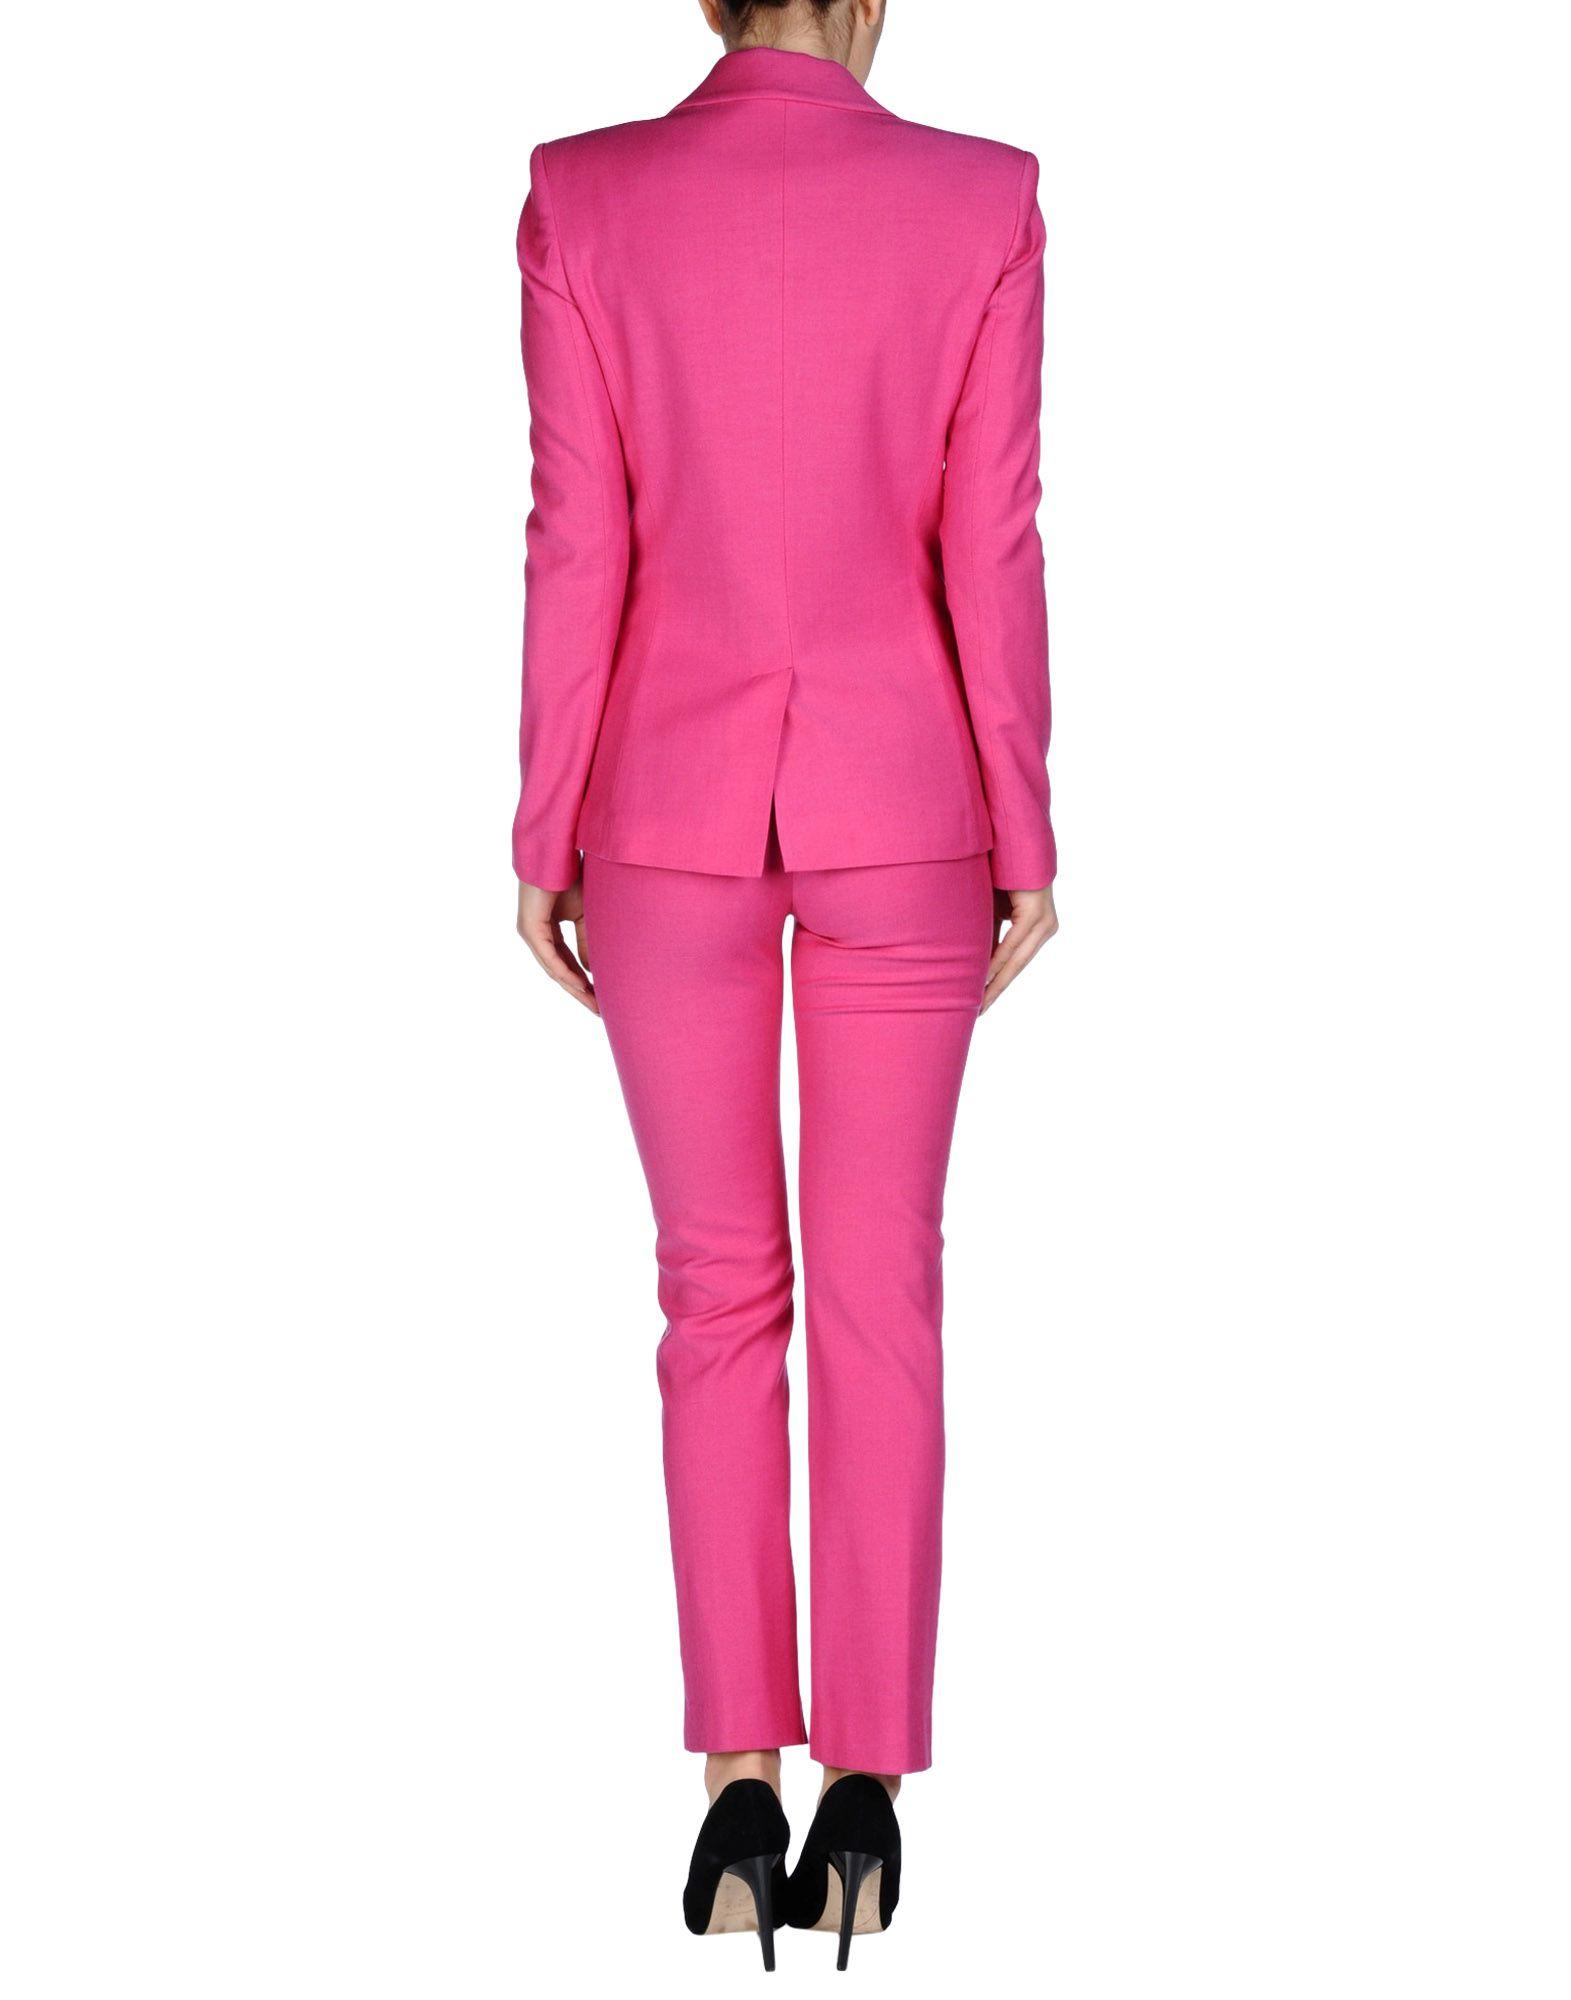 Lyst - John Galliano Women's Suit in Pink